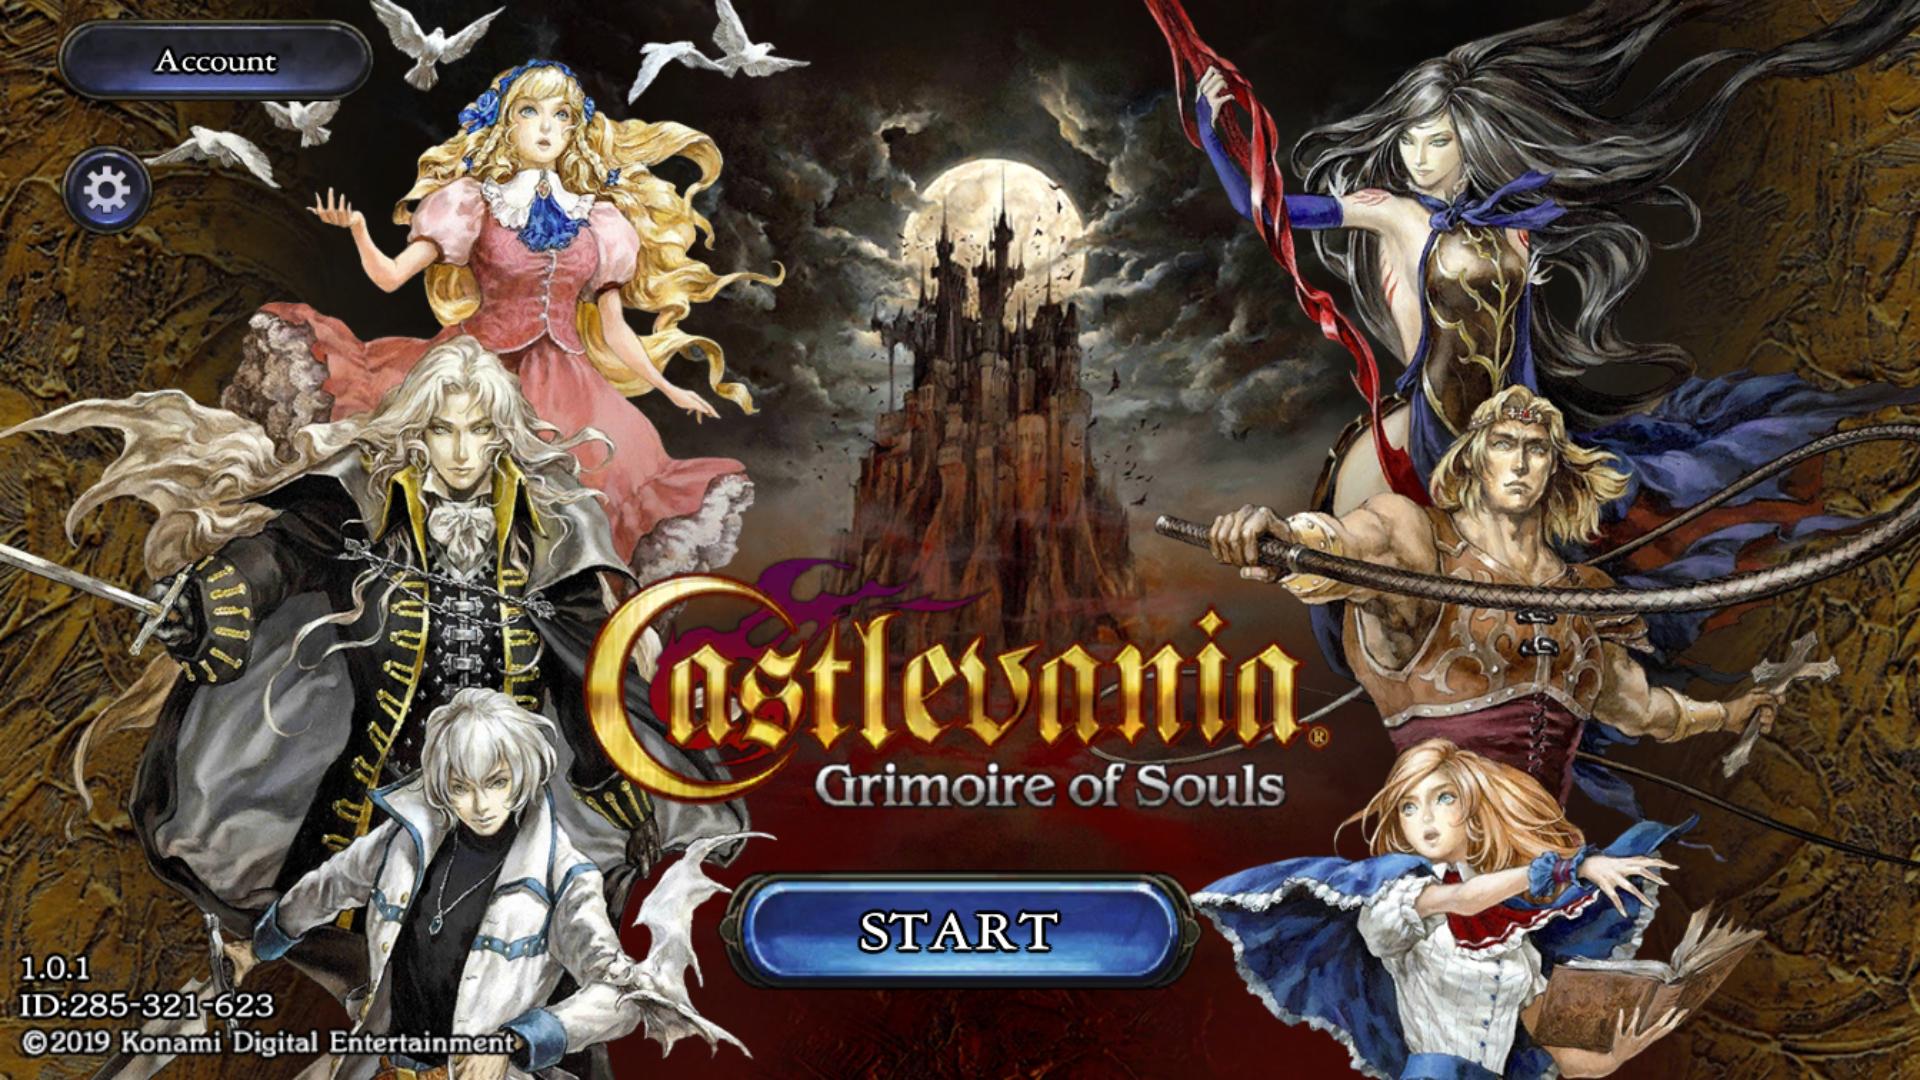 Castlevania Grimoire Of Souls Castlevania Wiki Fandom